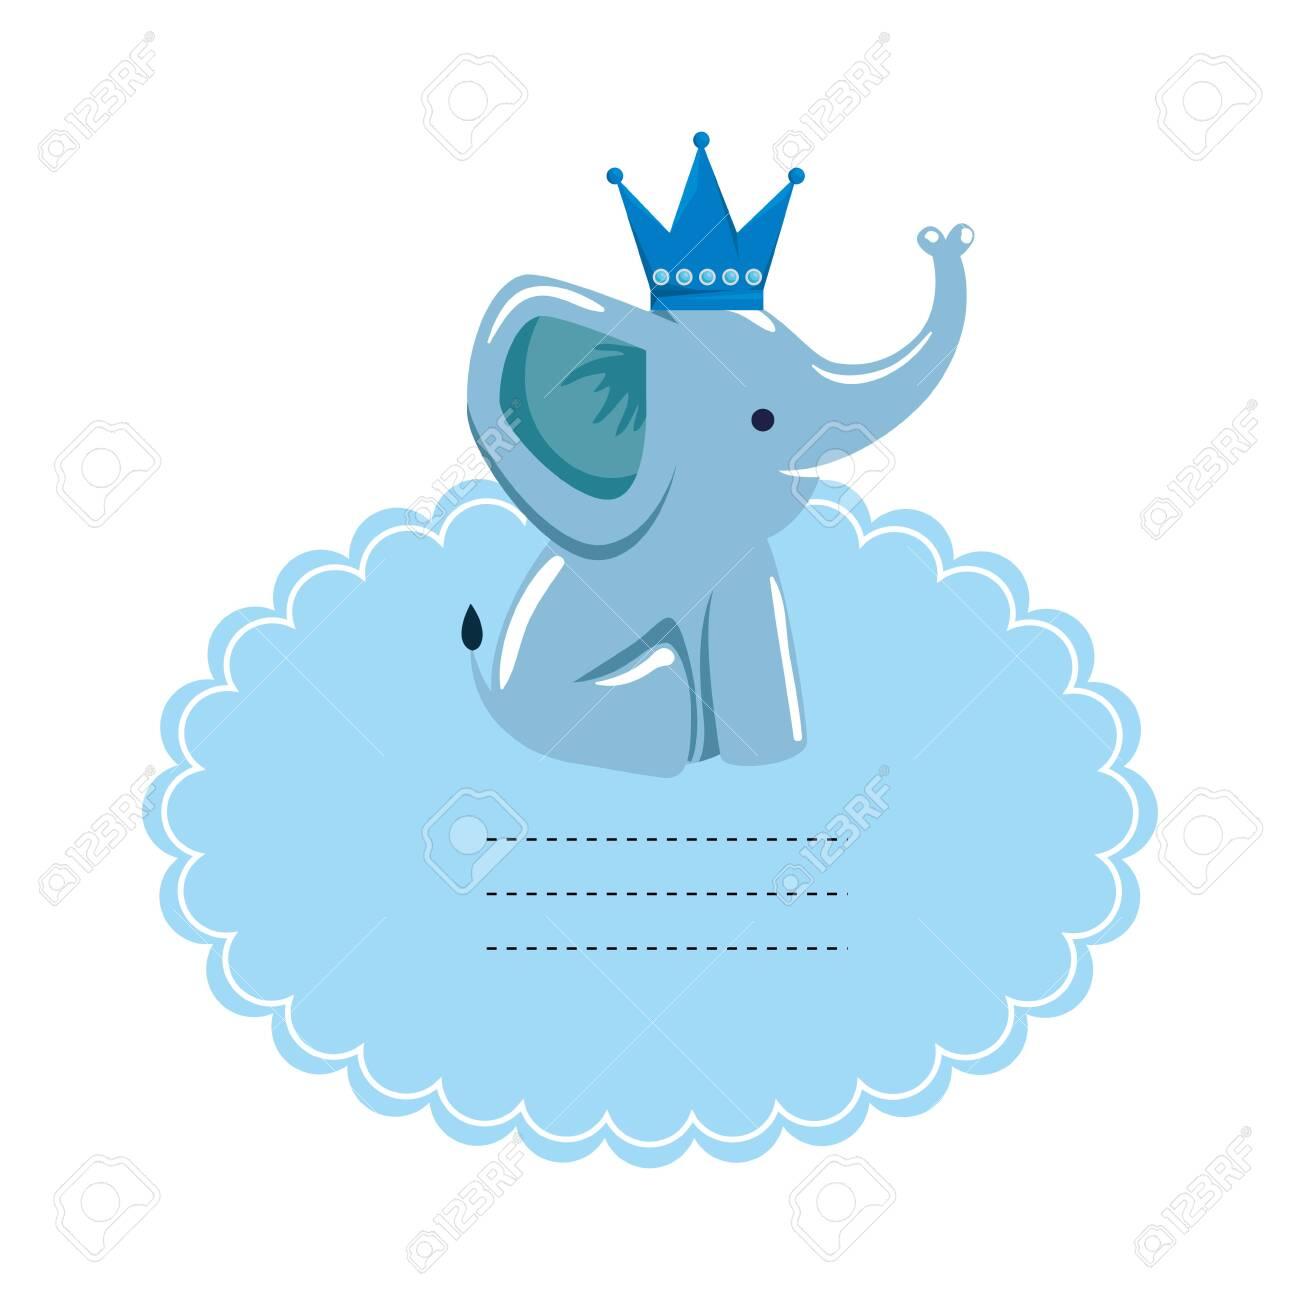 baby shower card with little elephant vector illustration design - 130344362